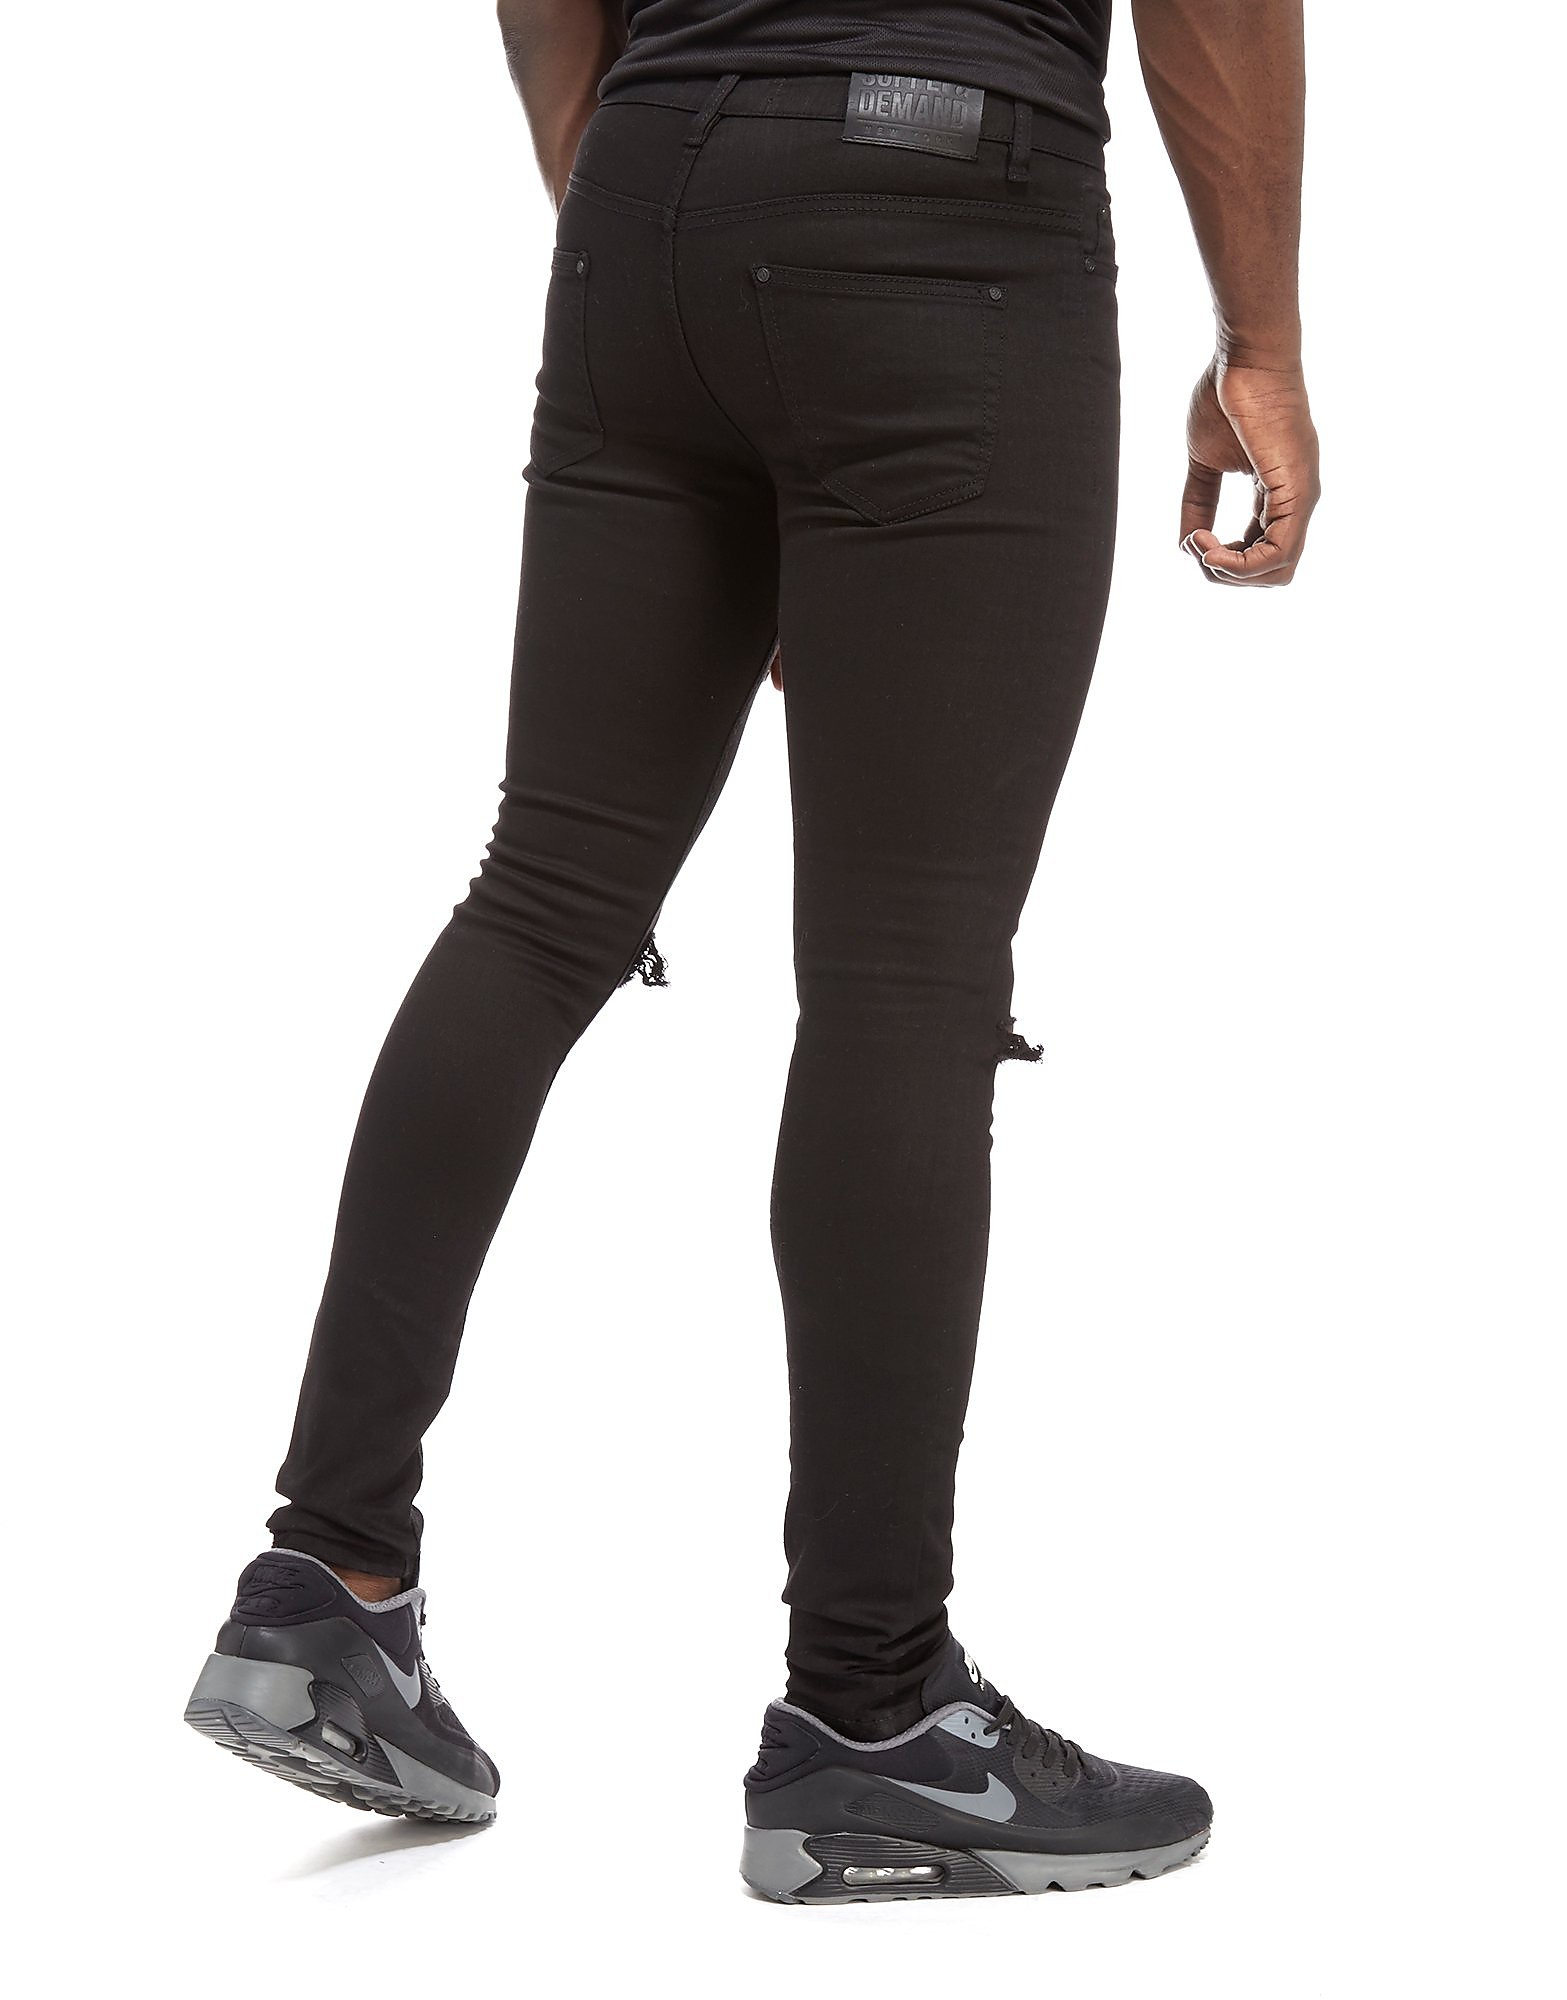 Supply & Demand Skyline Jeans.